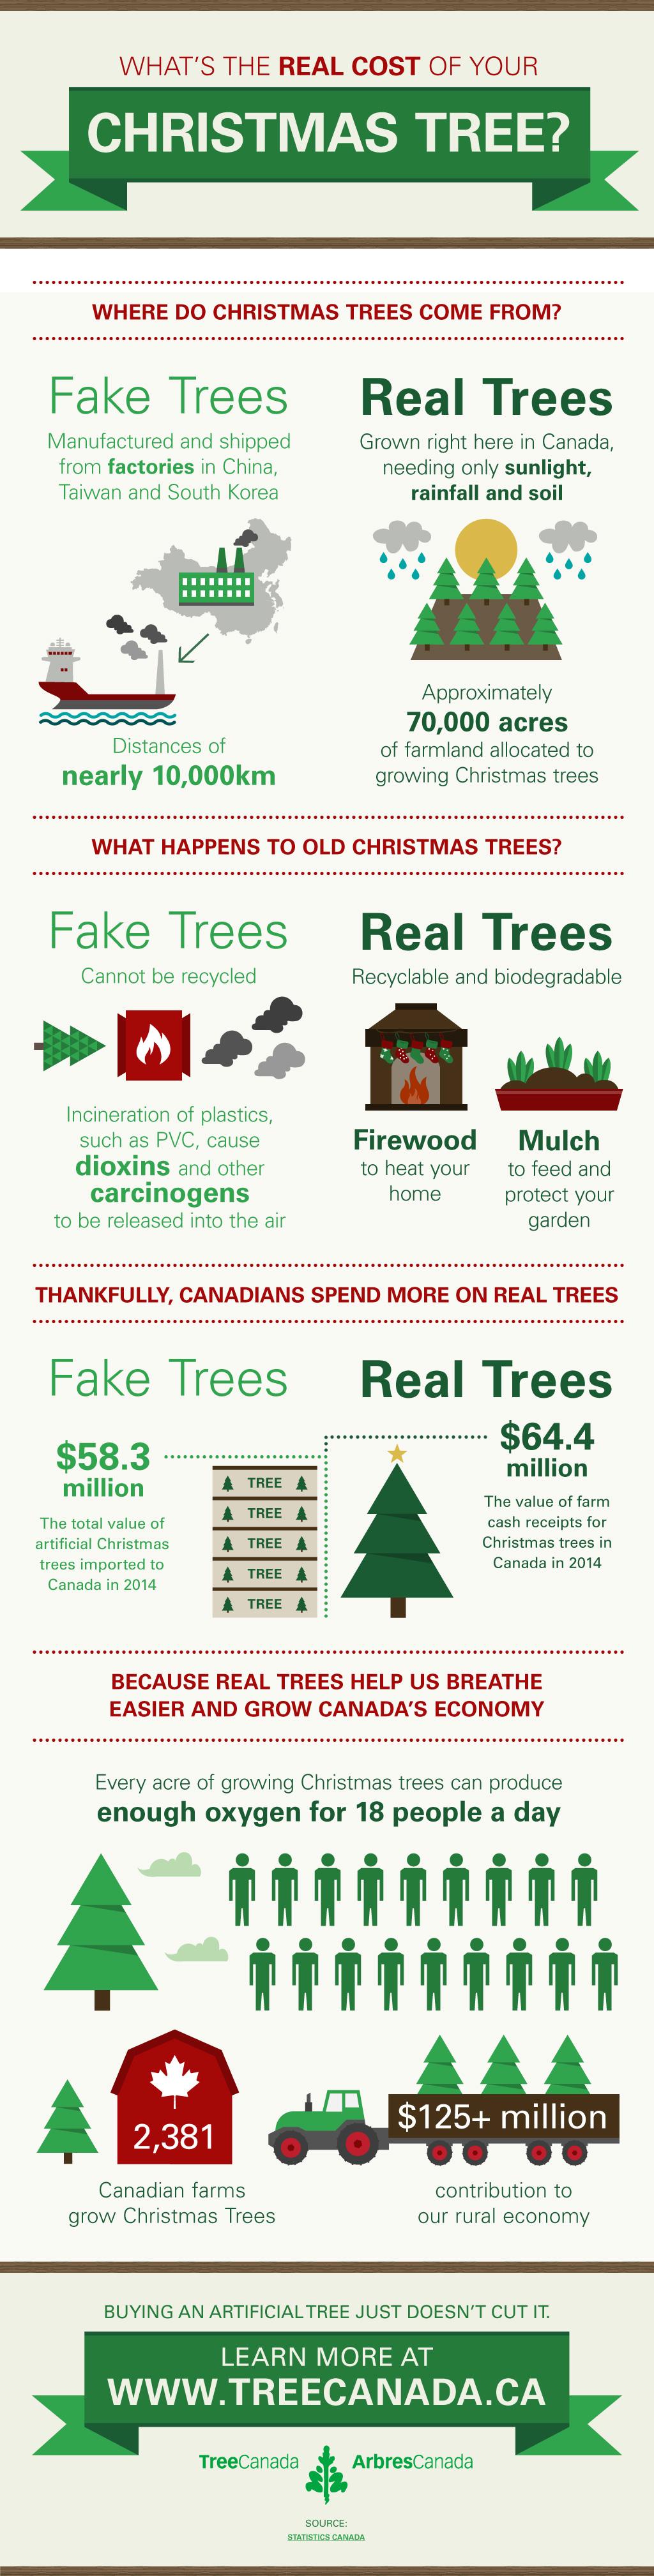 2015-12-14-1450119214-9036799-TreeCanada_ChristmasInfographic_Dec1st.jpg